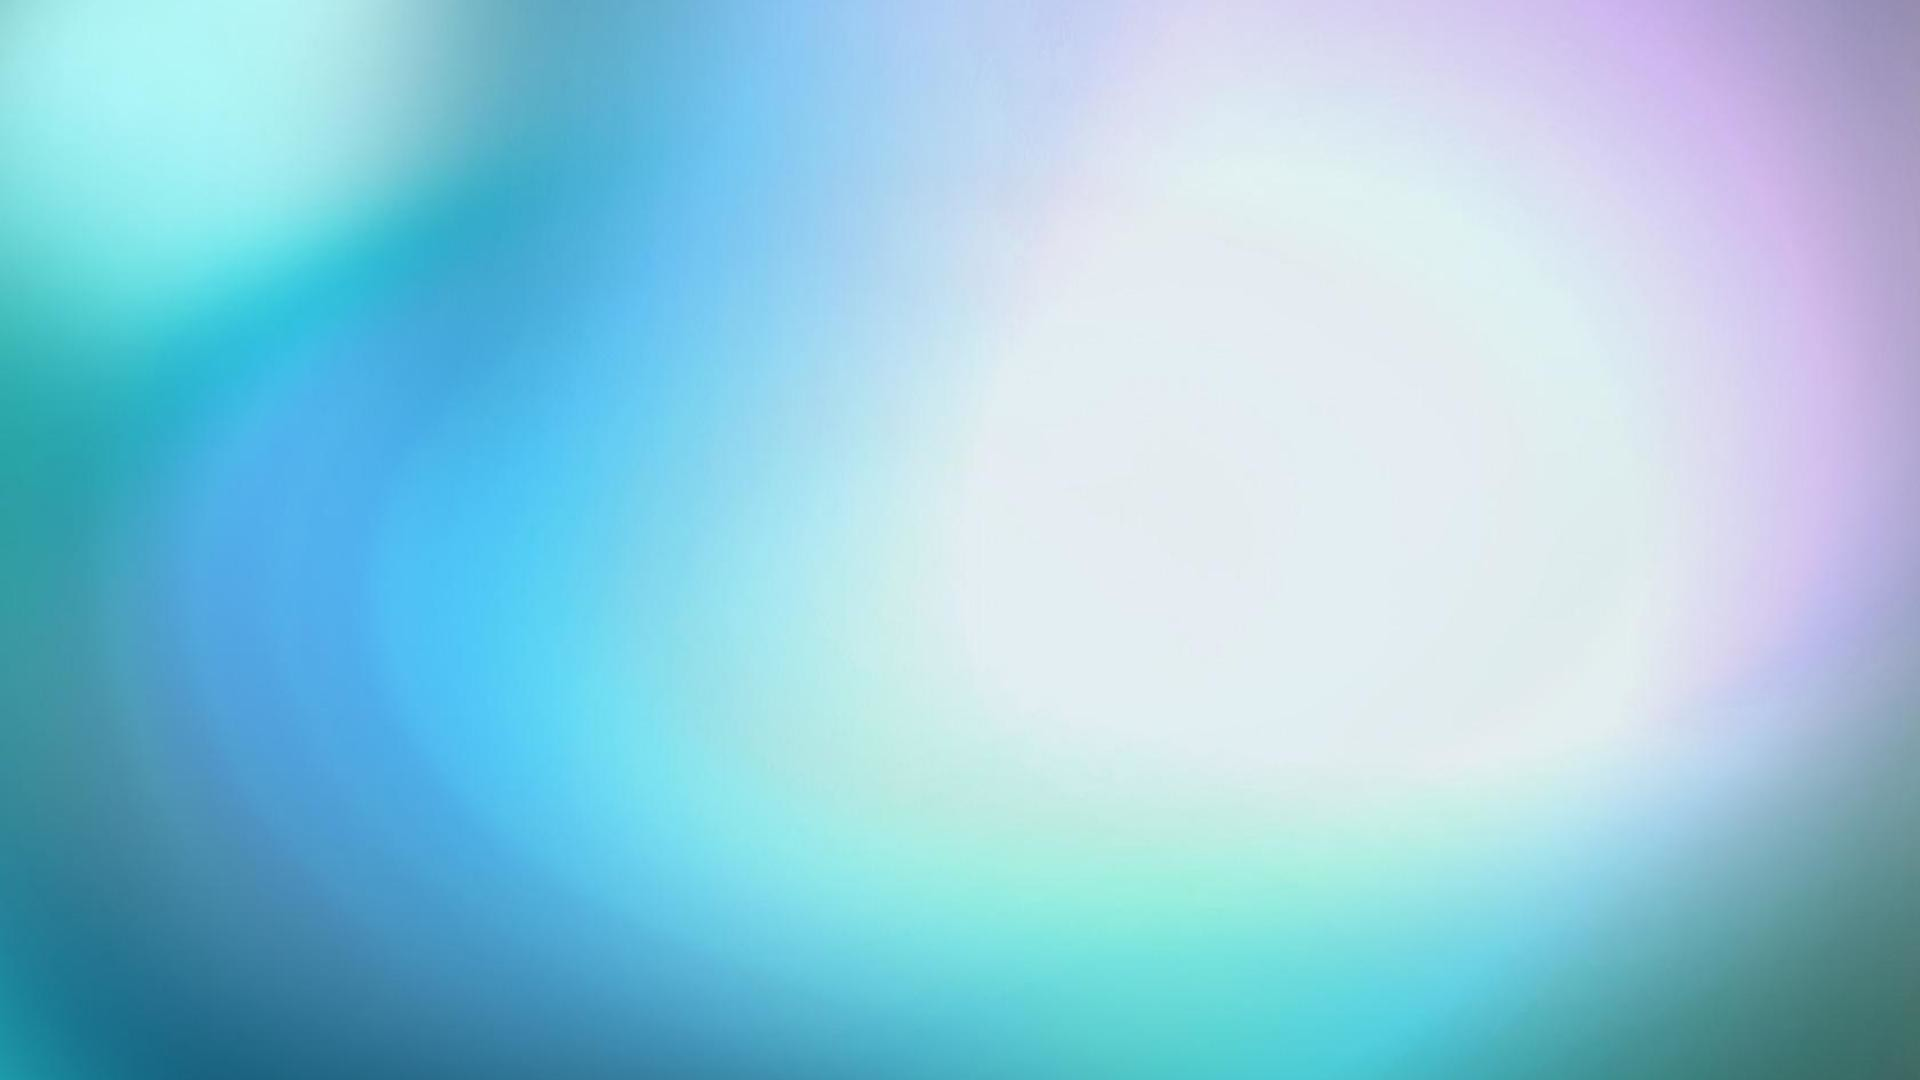 The Color Light Blue – wallpaper.